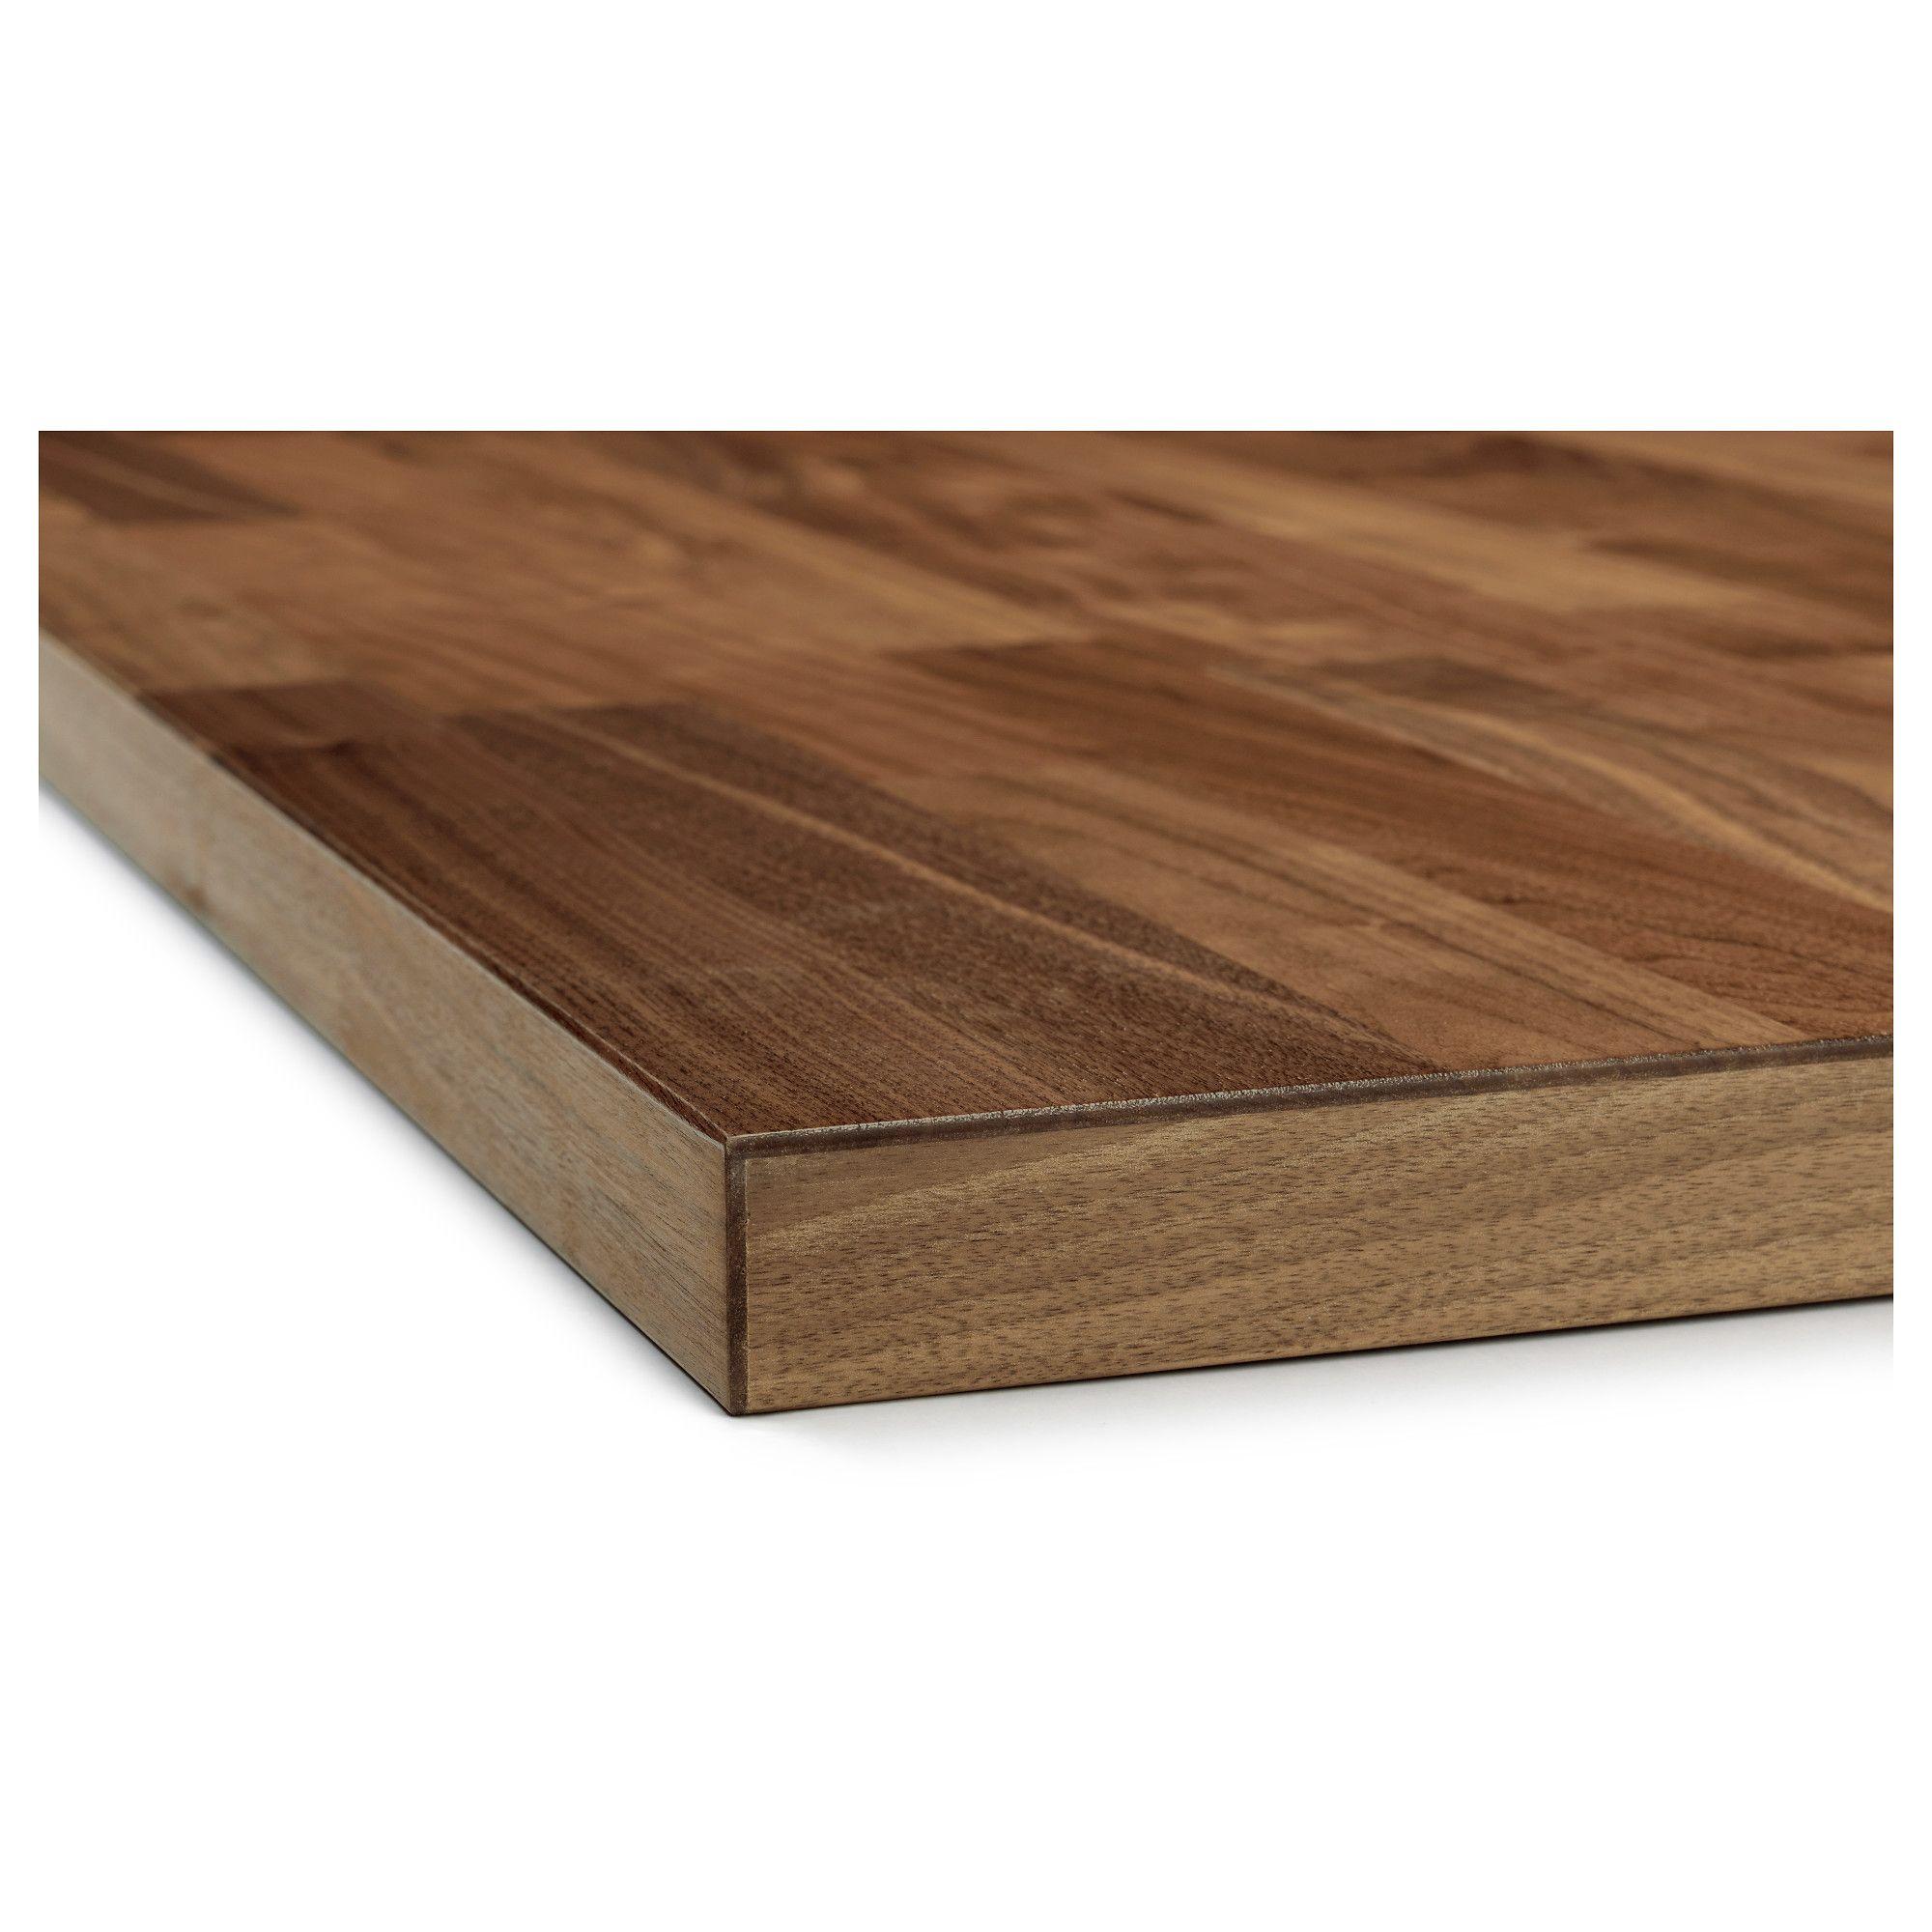 Ikea Karlby Countertop For Kitchen Island Walnut